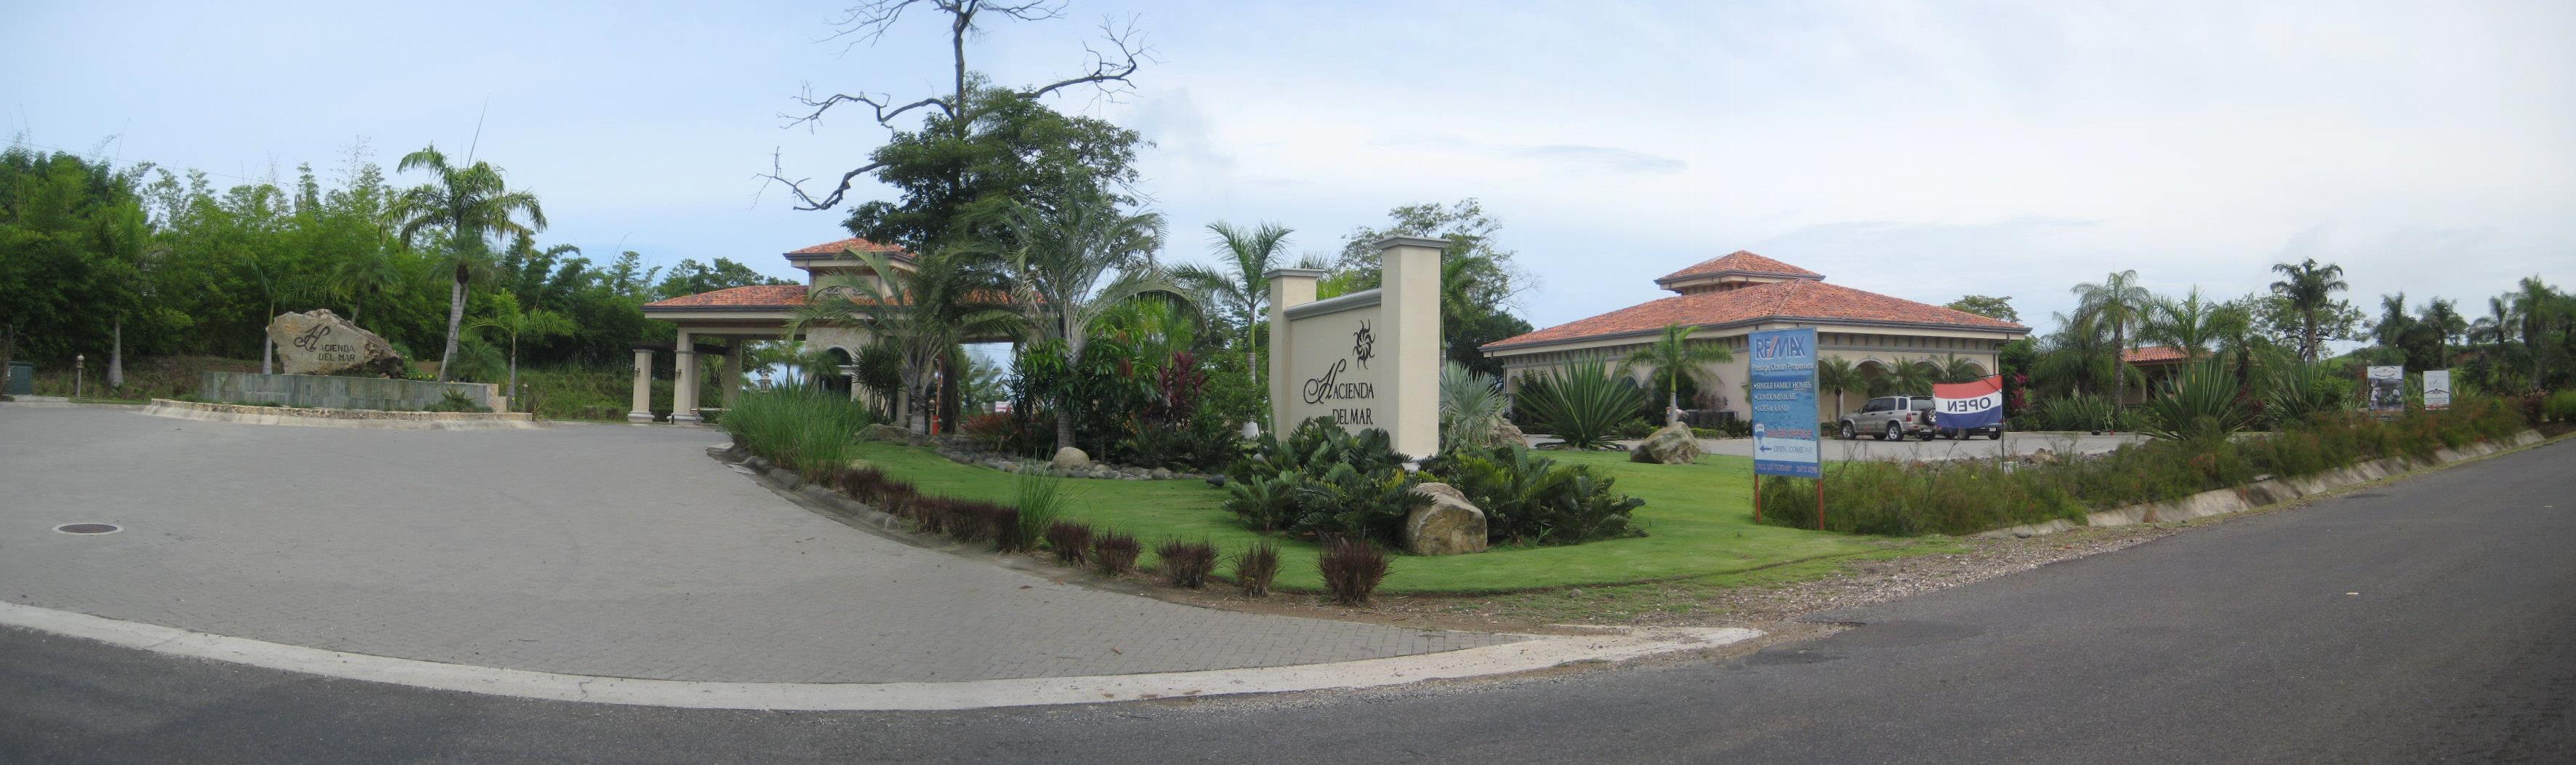 ReMax Prestige Ocean Properties Office, Playa Panama, Costa Rica